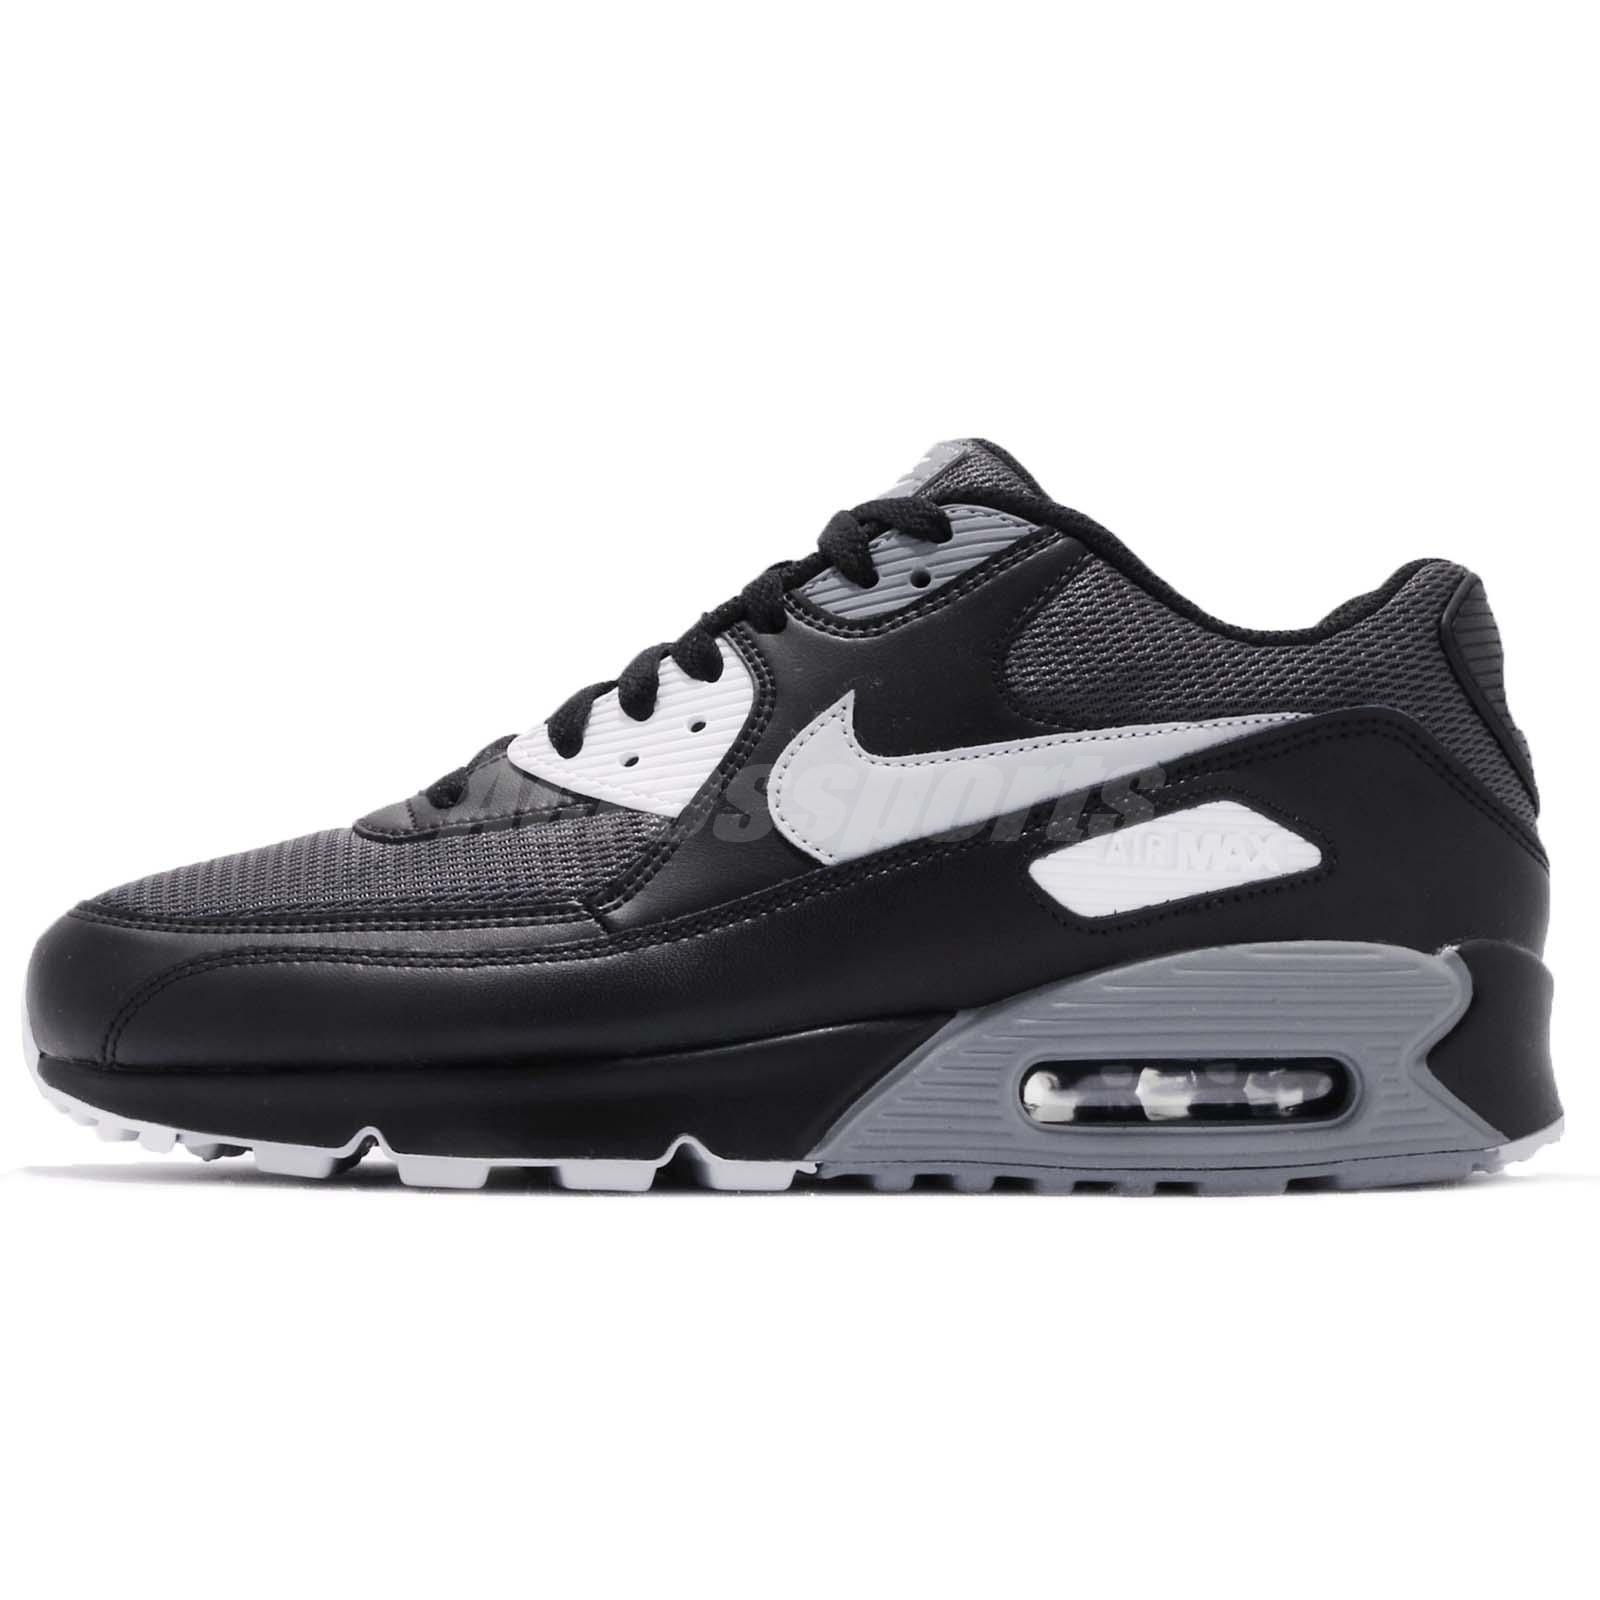 on sale 774d5 4777d ... store nike air max 90 essential black wolf dark grey men running shoes  aj1285 003 fe9d1